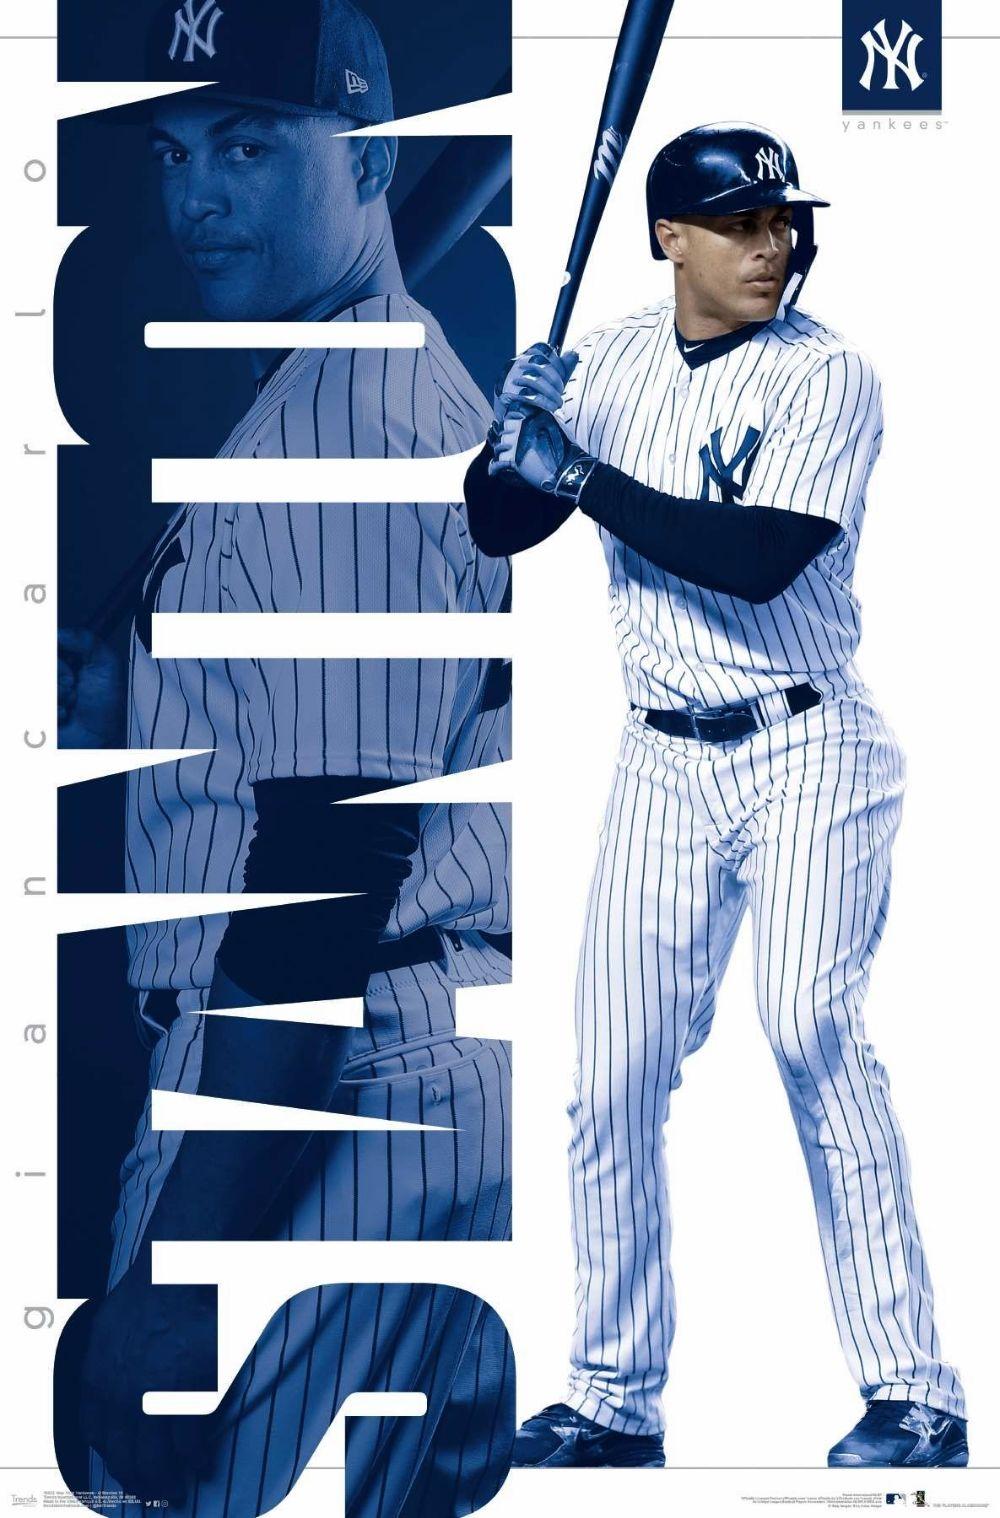 New York Yankees In 2020 New York Yankees Logo New York Yankees New York Yankees Baseball